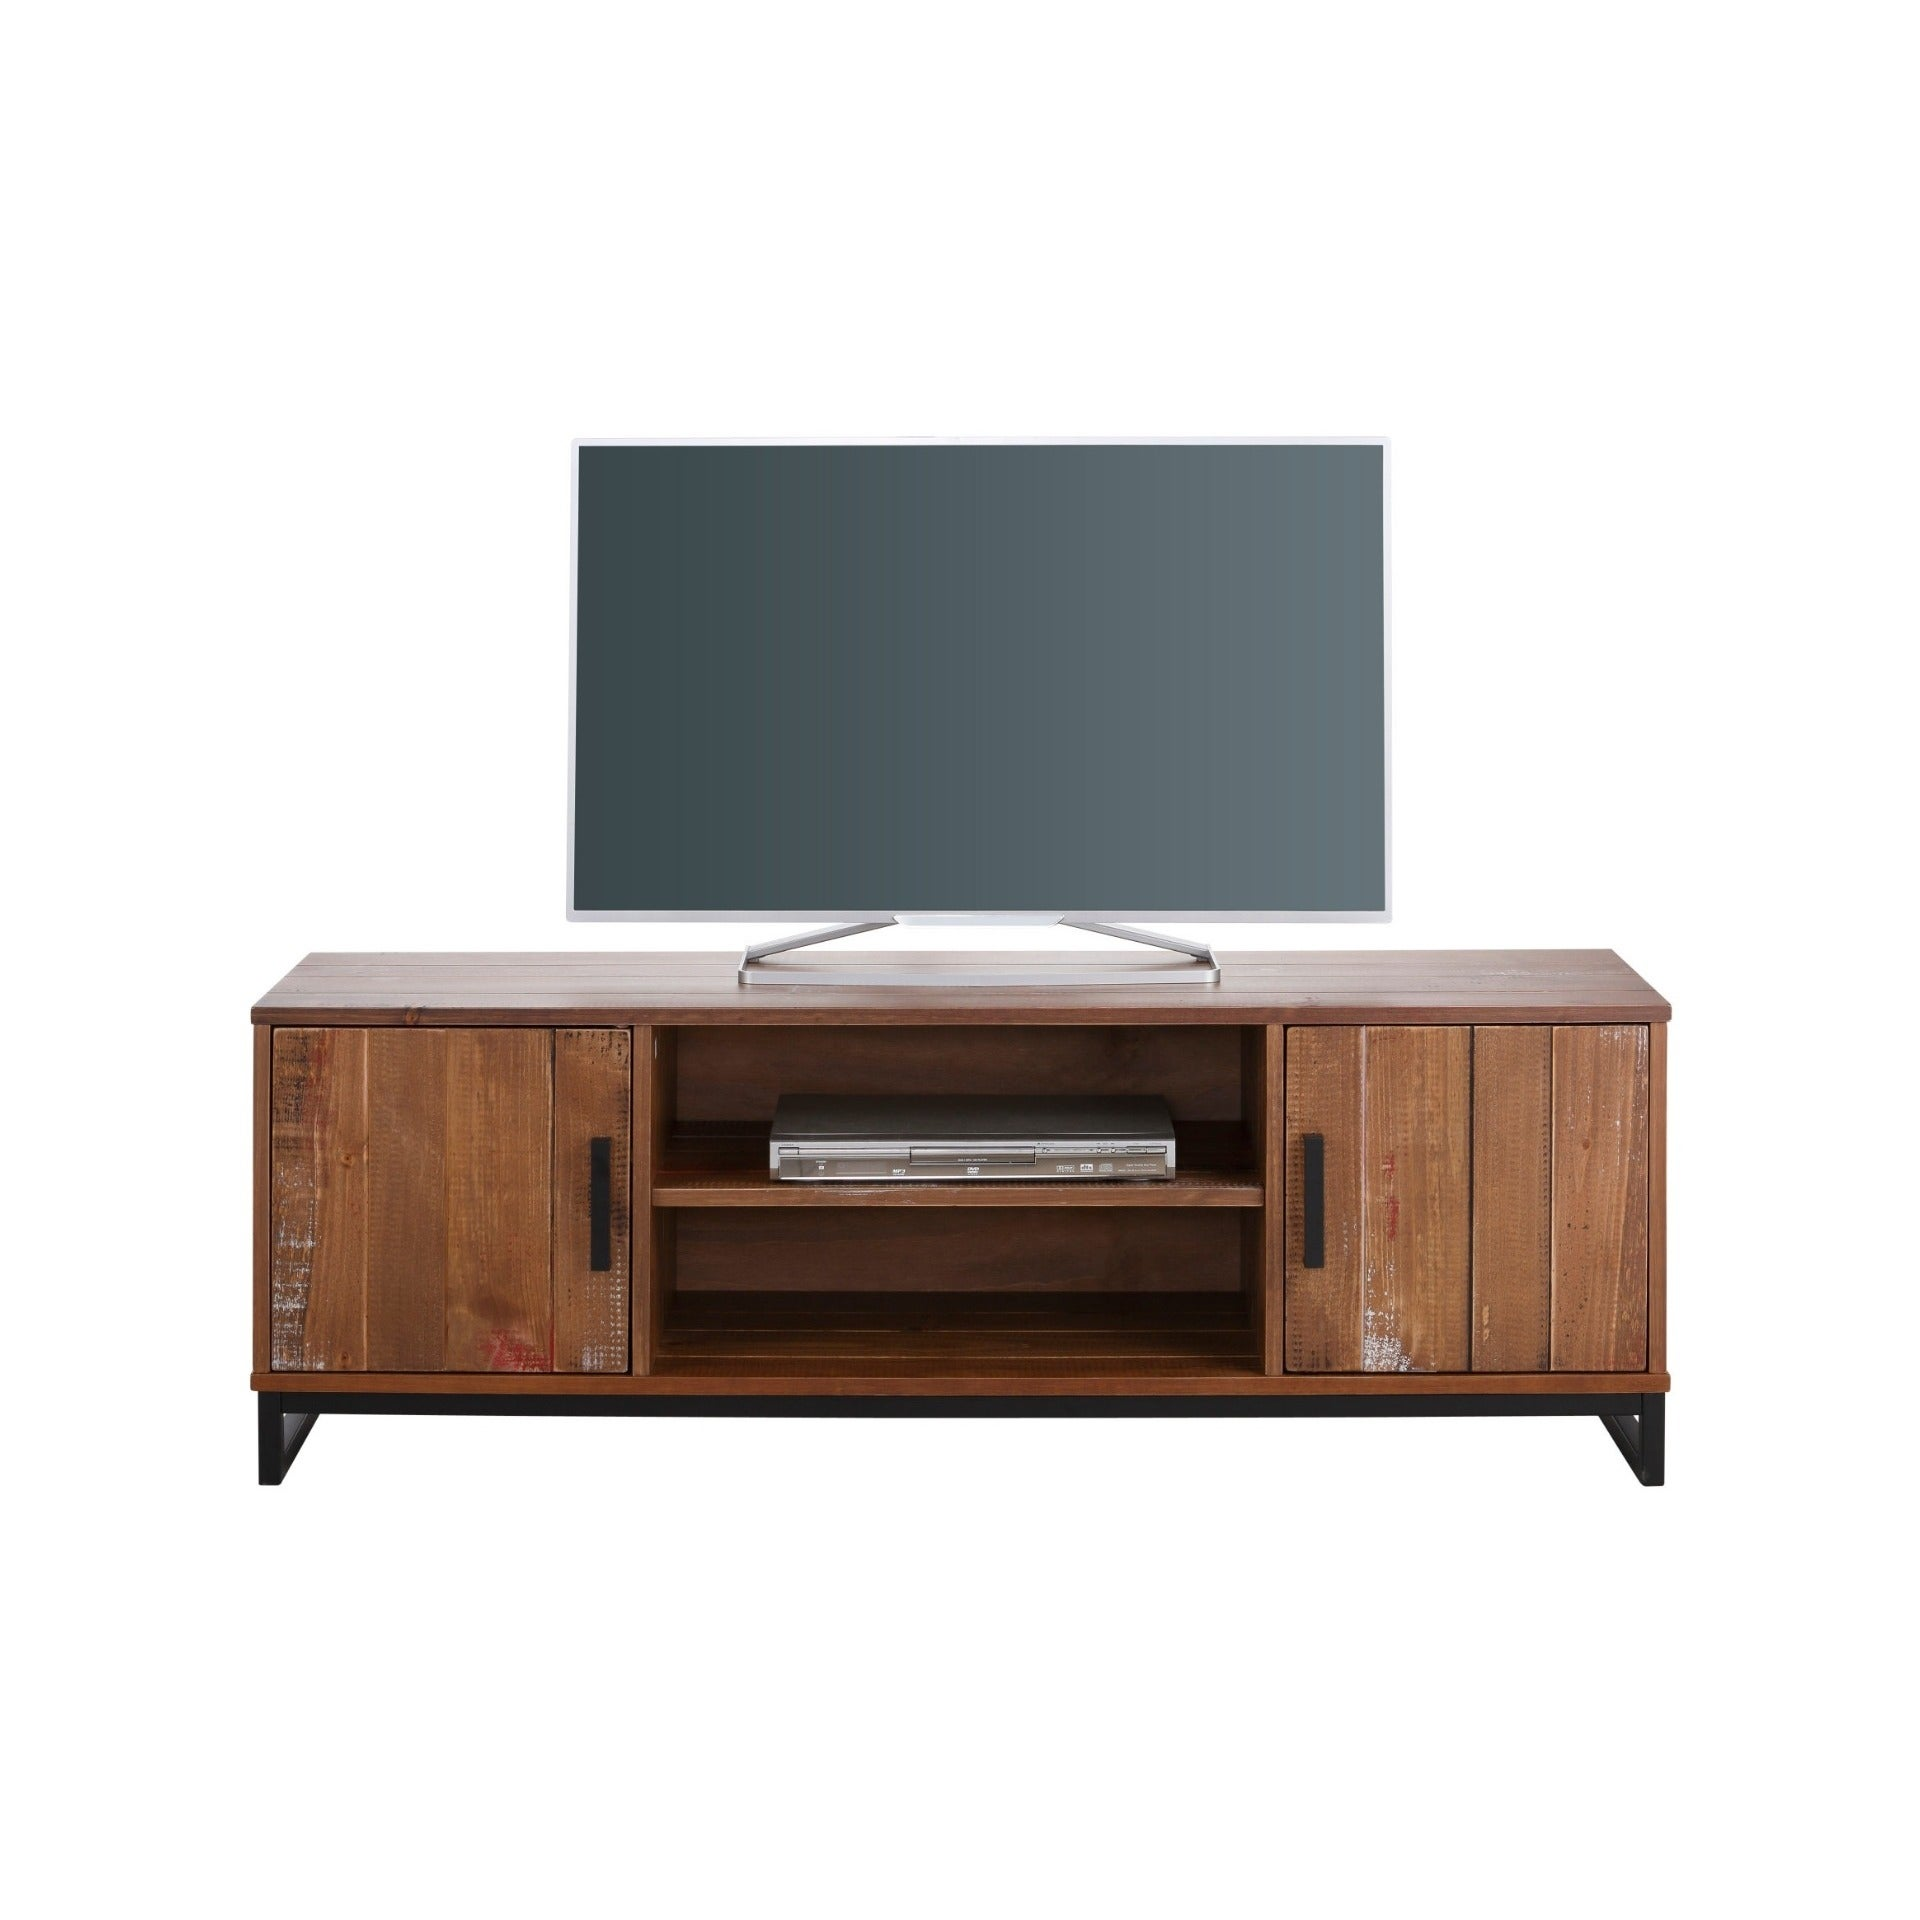 Elegant Shop Santana Distressed Cream Pine/Metal 2 Door 3 Shelf TV Lowboard   On  Sale   Free Shipping Today   Overstock.com   18003849